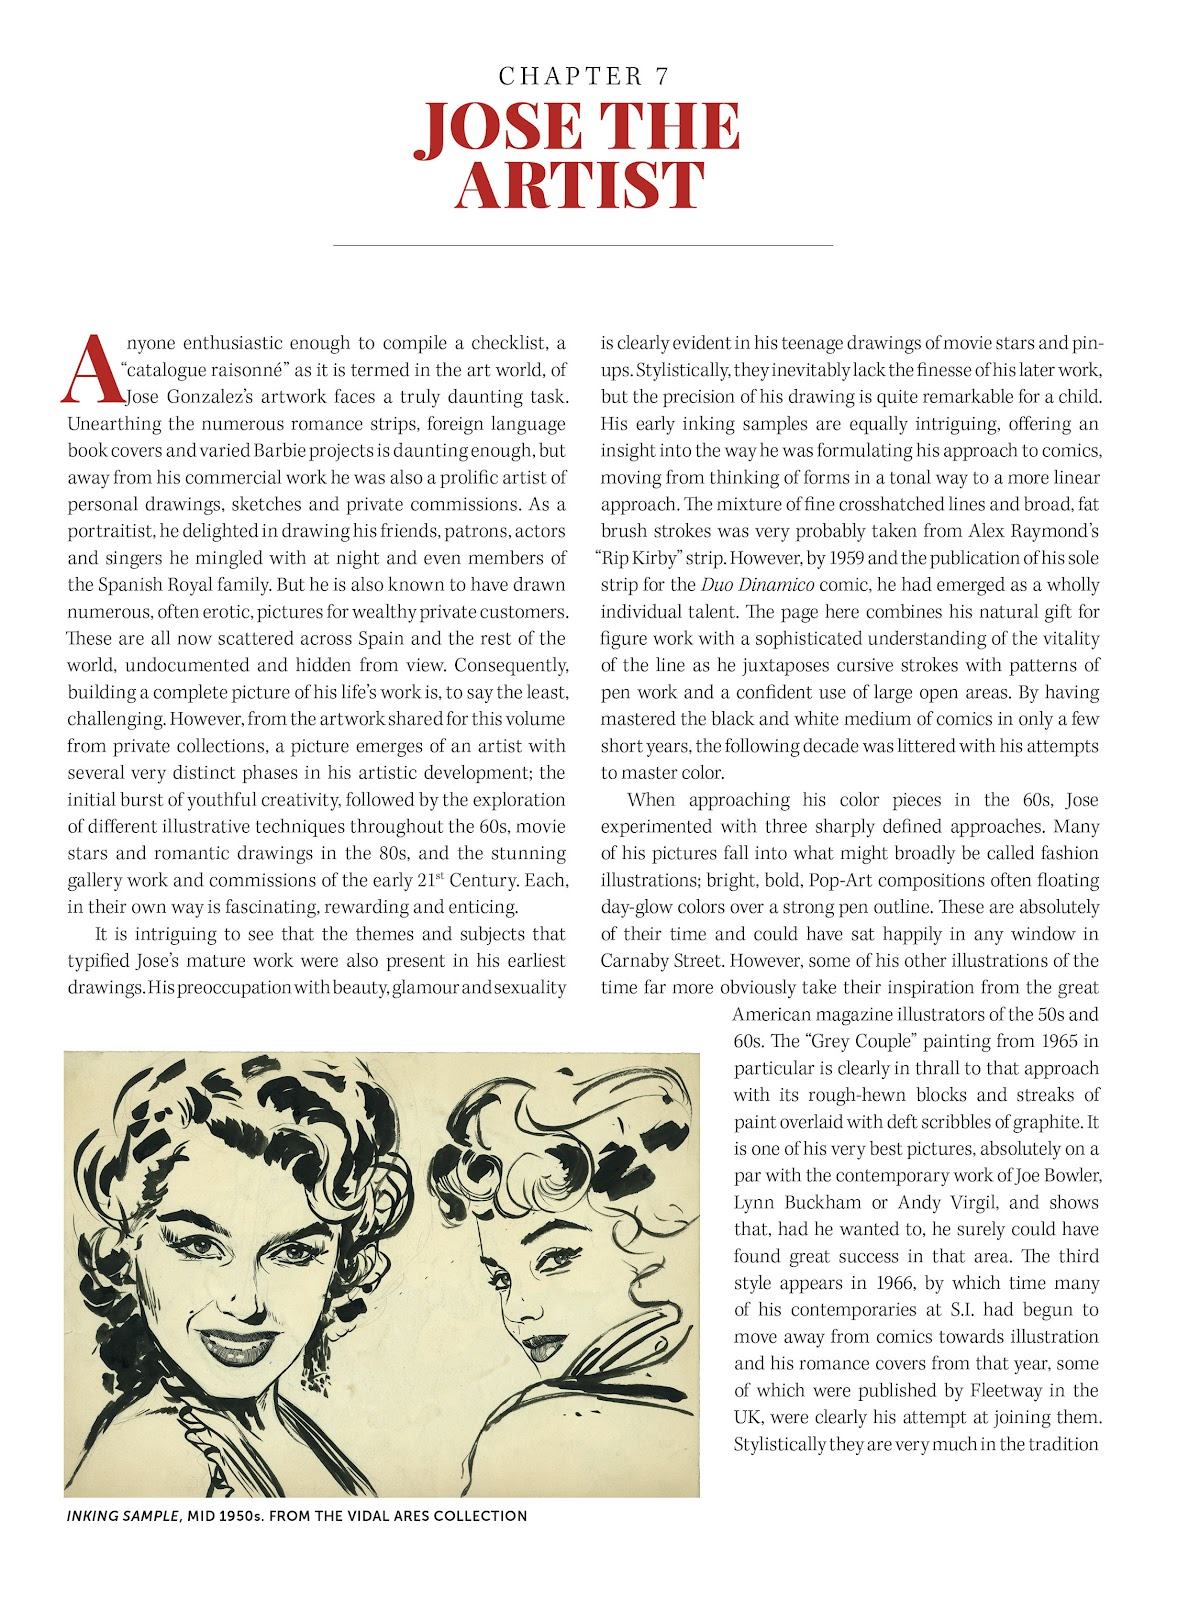 Read online The Art of Jose Gonzalez comic -  Issue # TPB (Part 2) - 86